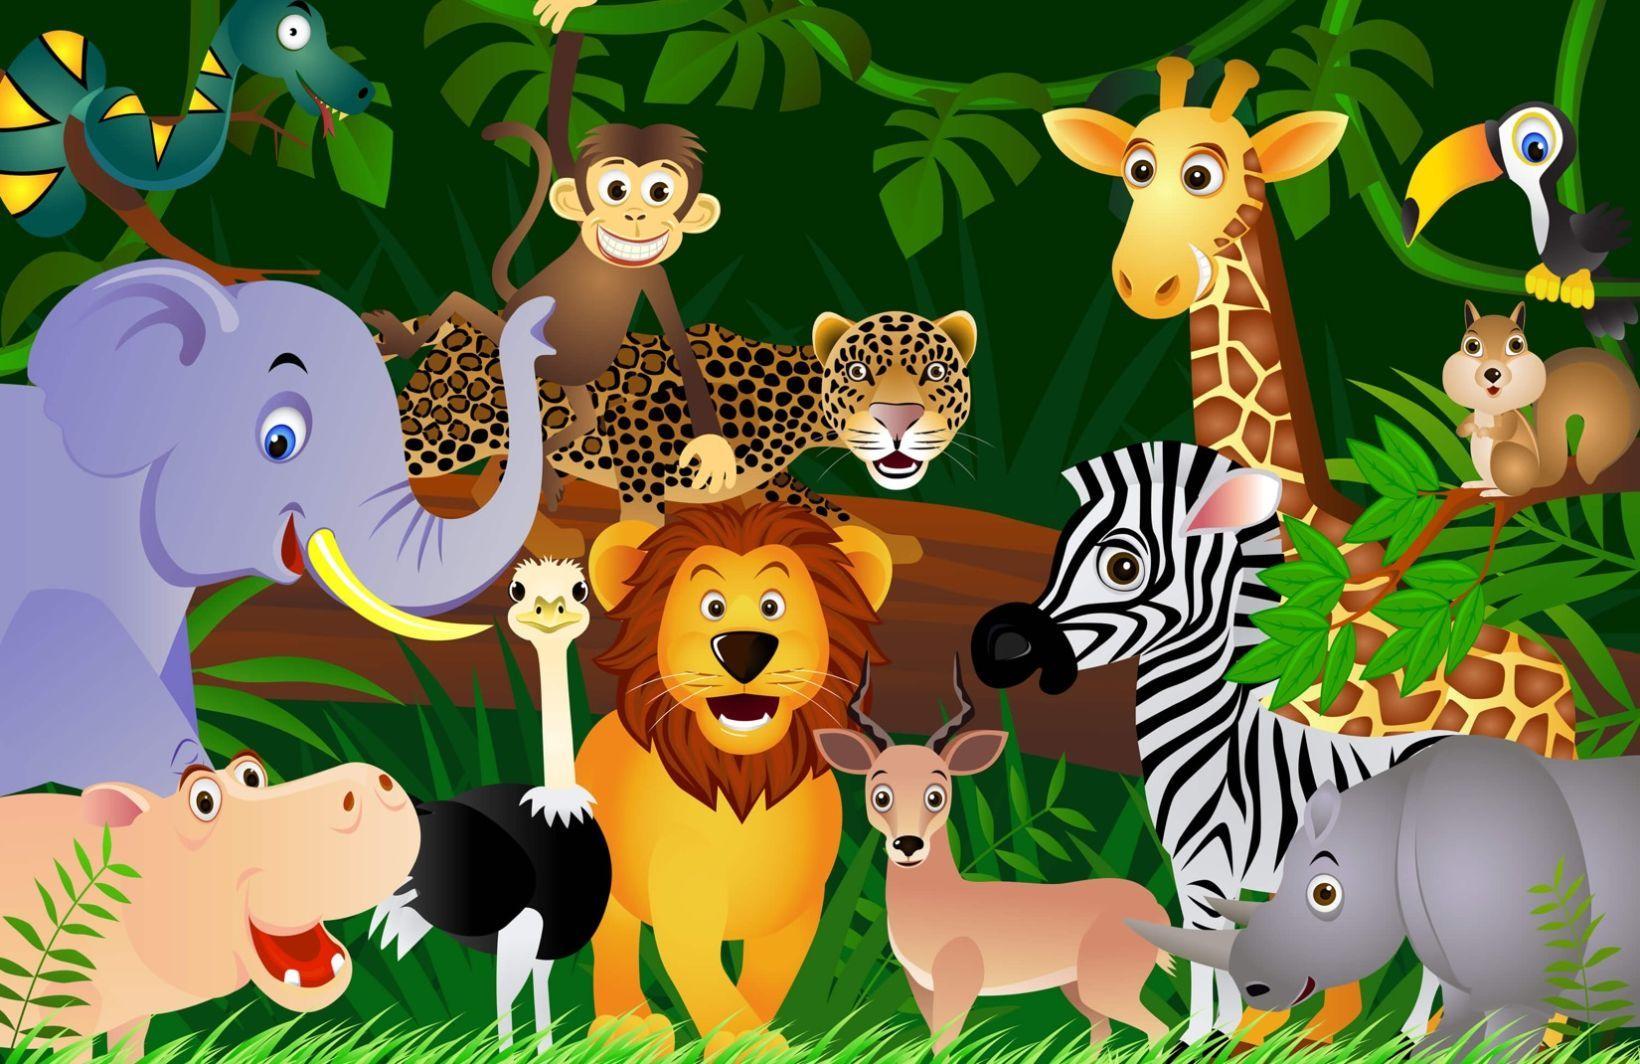 Jungle Animals Wallpaper Mural Hovia Uk Animal Mural Jungle Animals Mural Murals For Kids